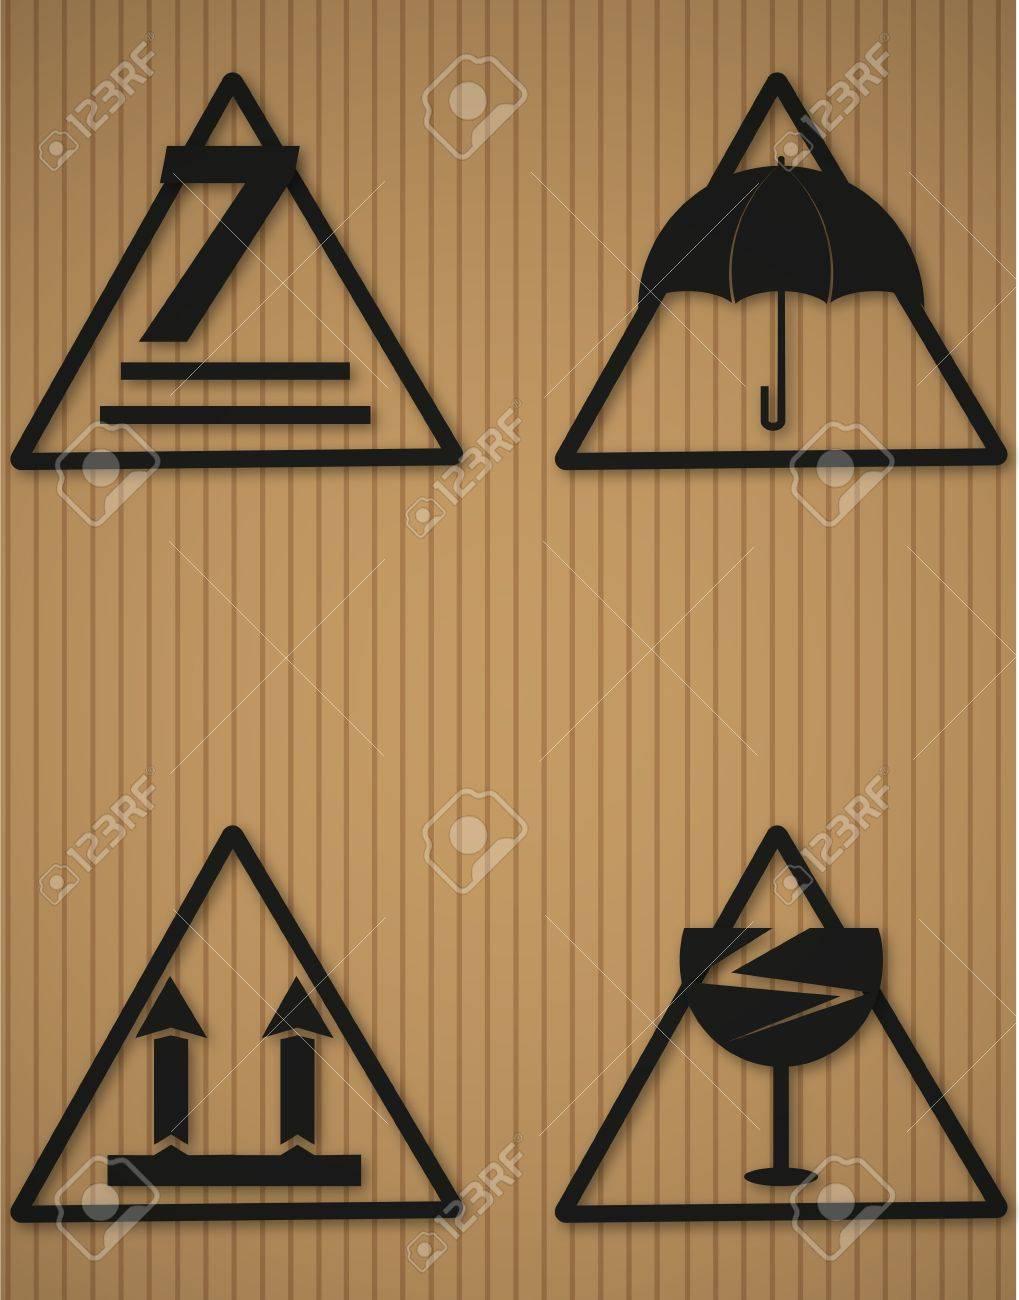 Box Fragile Symbol Stock Vector - 17974005